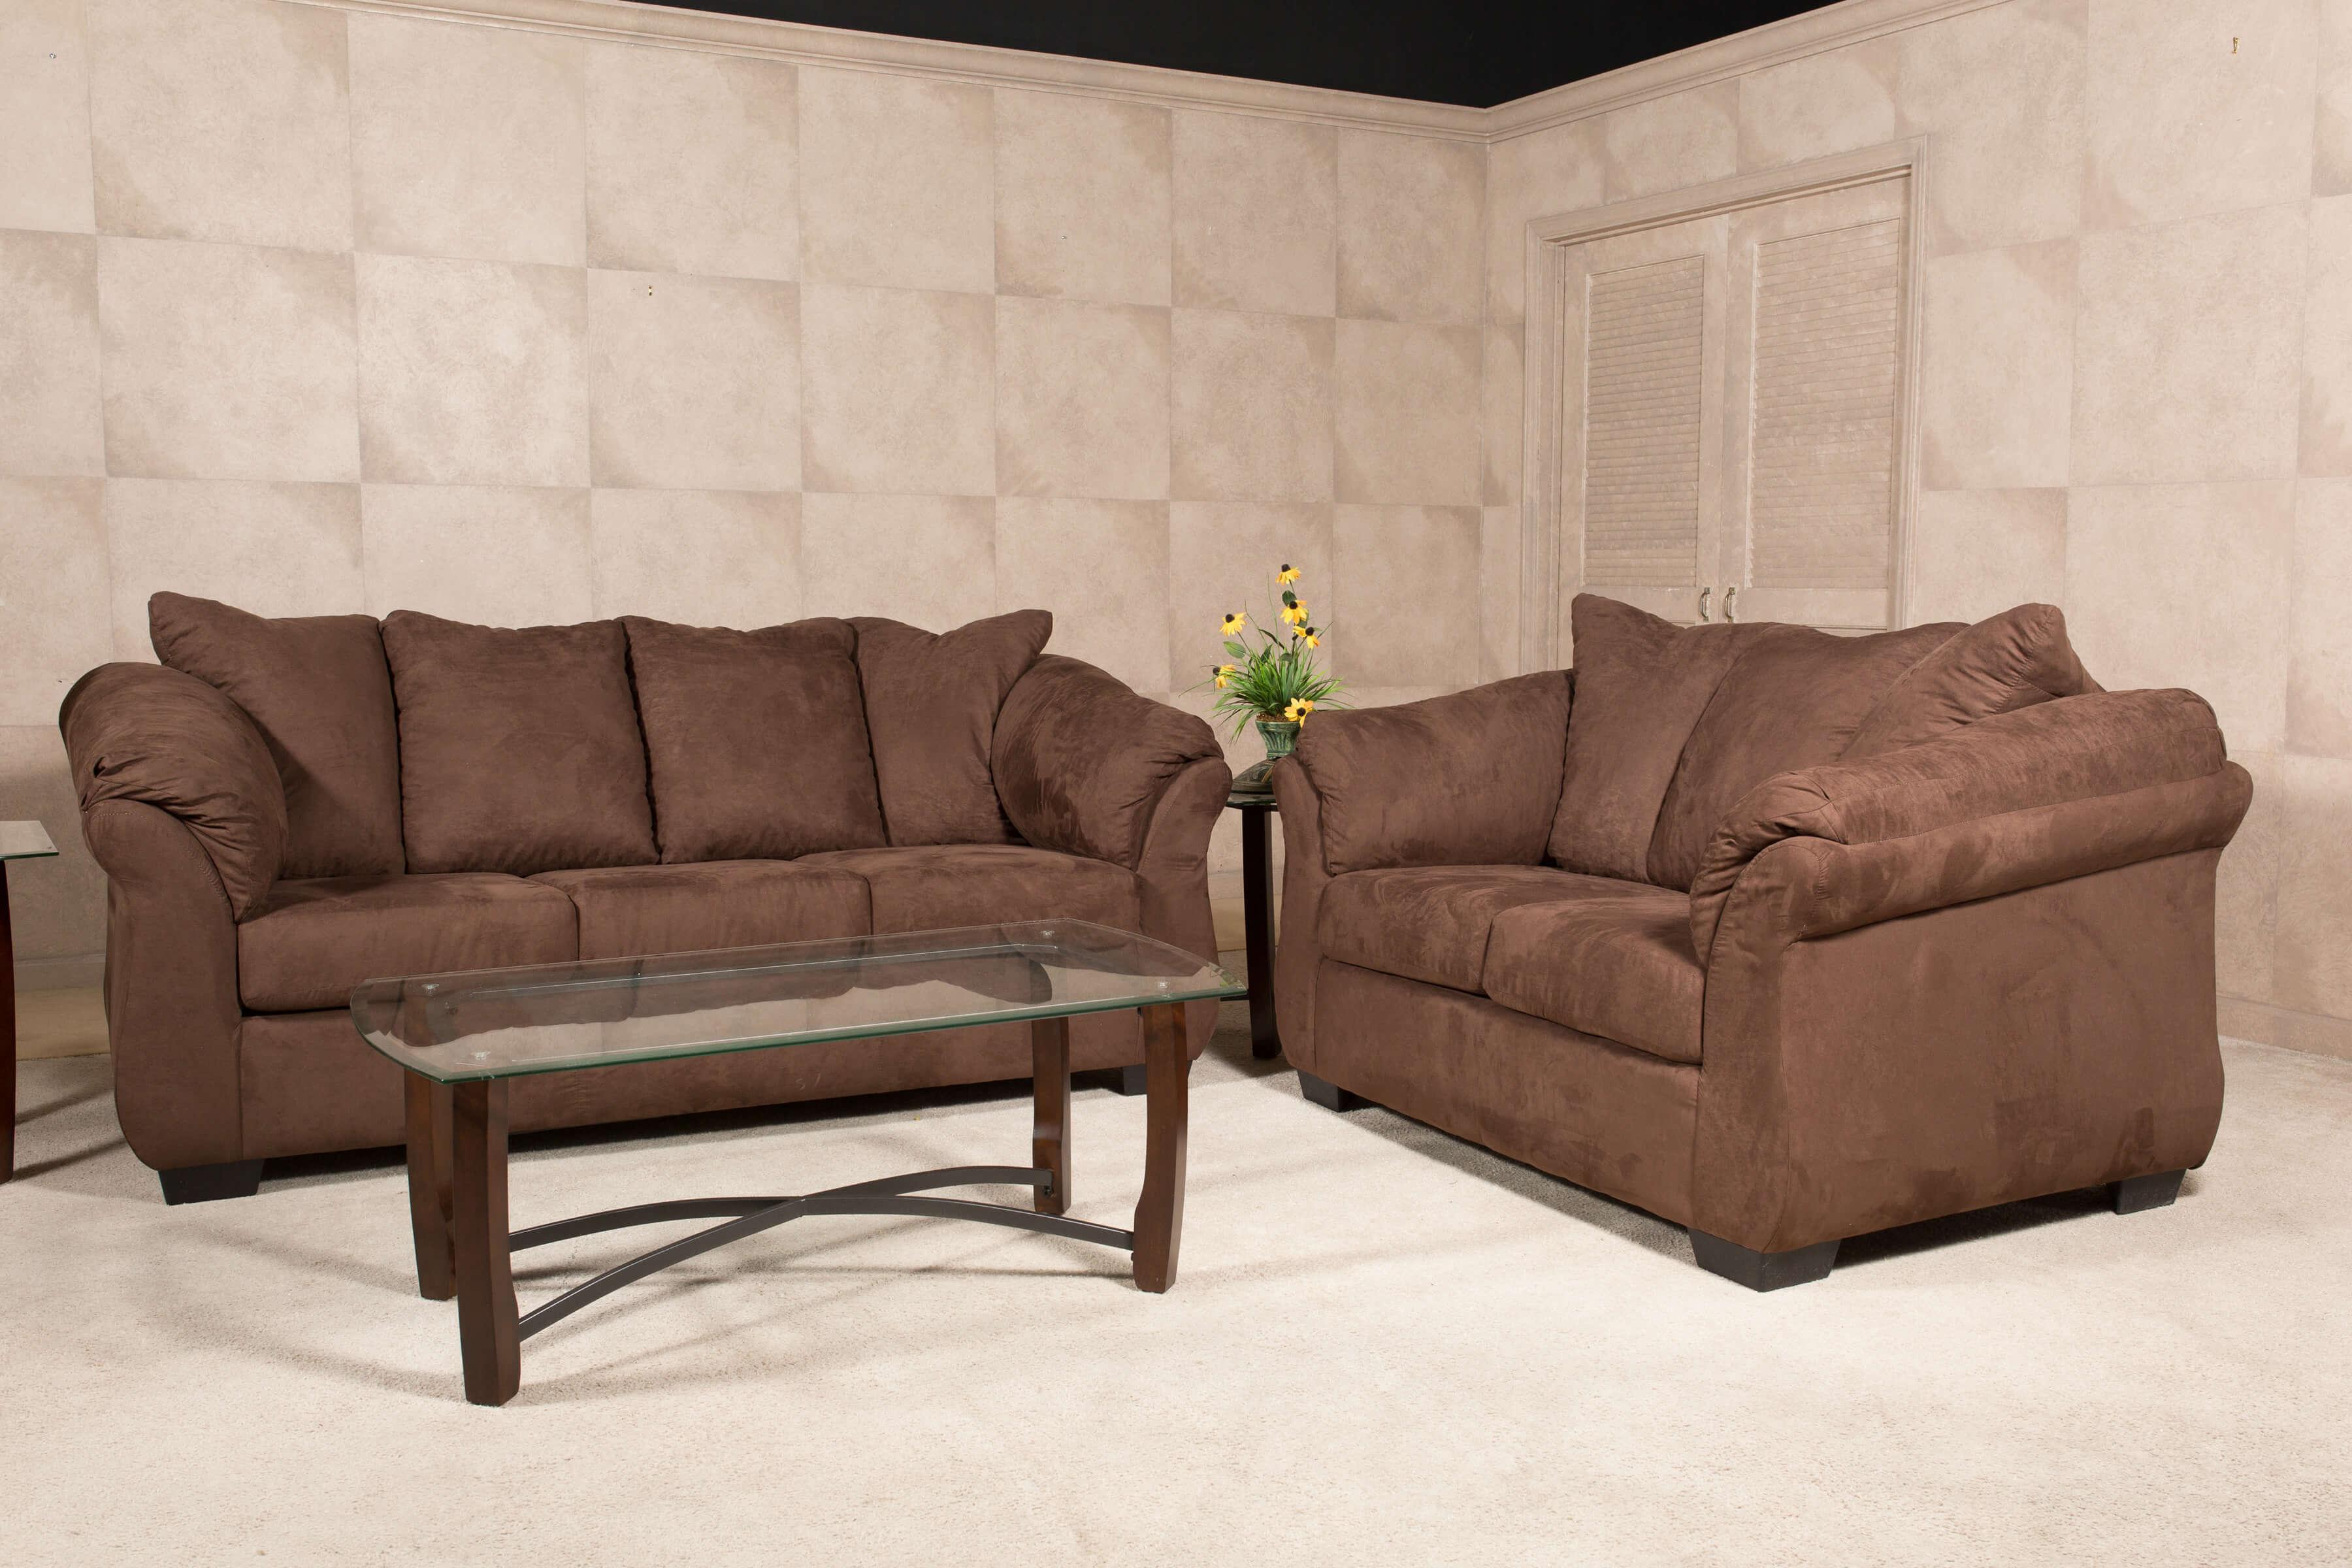 Bulldozer Java Sofa and Loveseat